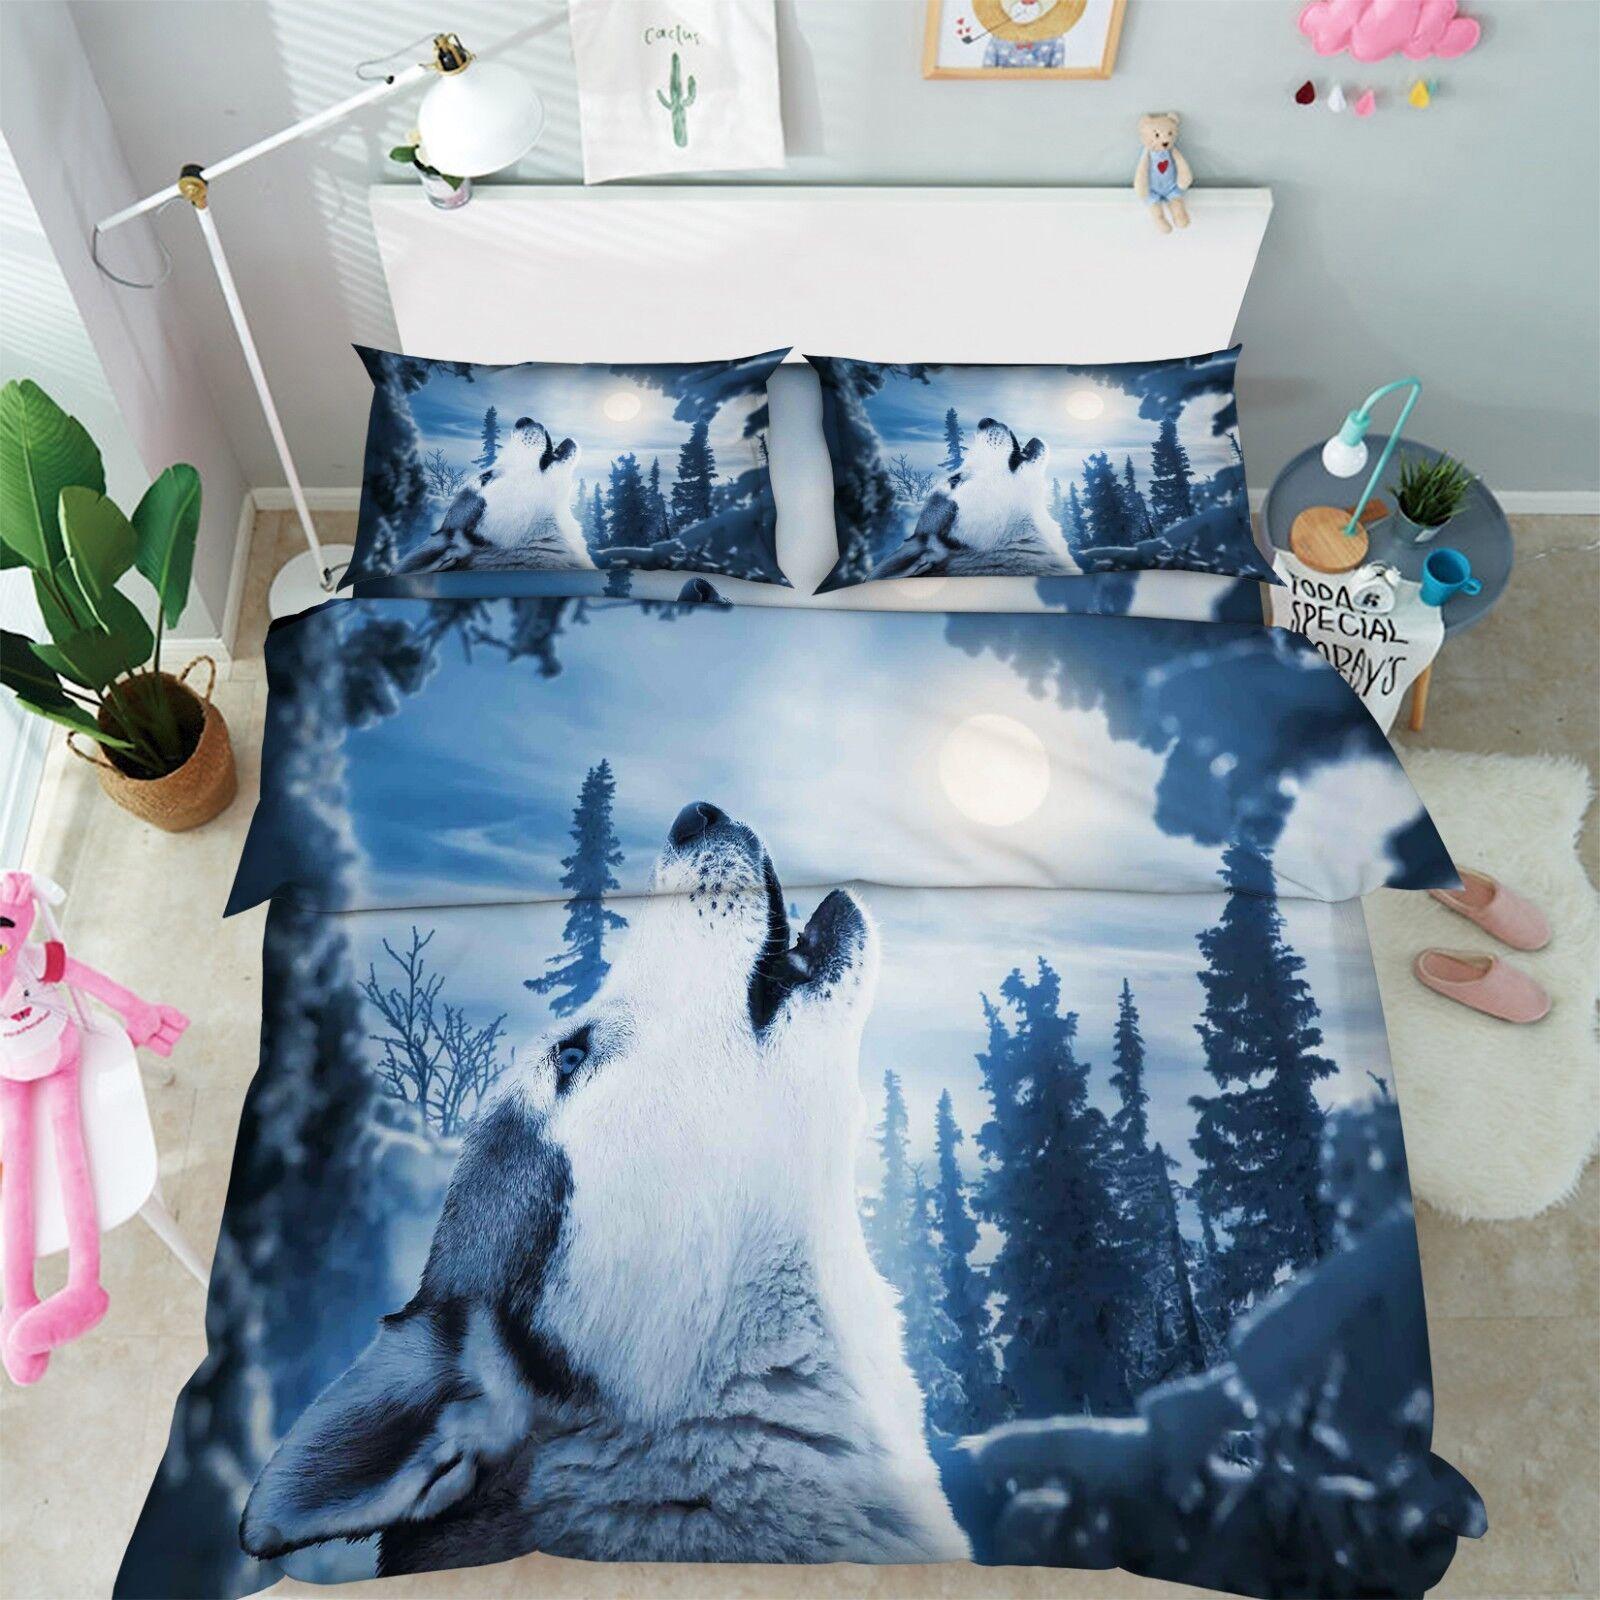 3D Jungle Wolf 808 Bed Pillowcases Quilt Duvet Cover Set Single Queen King CA